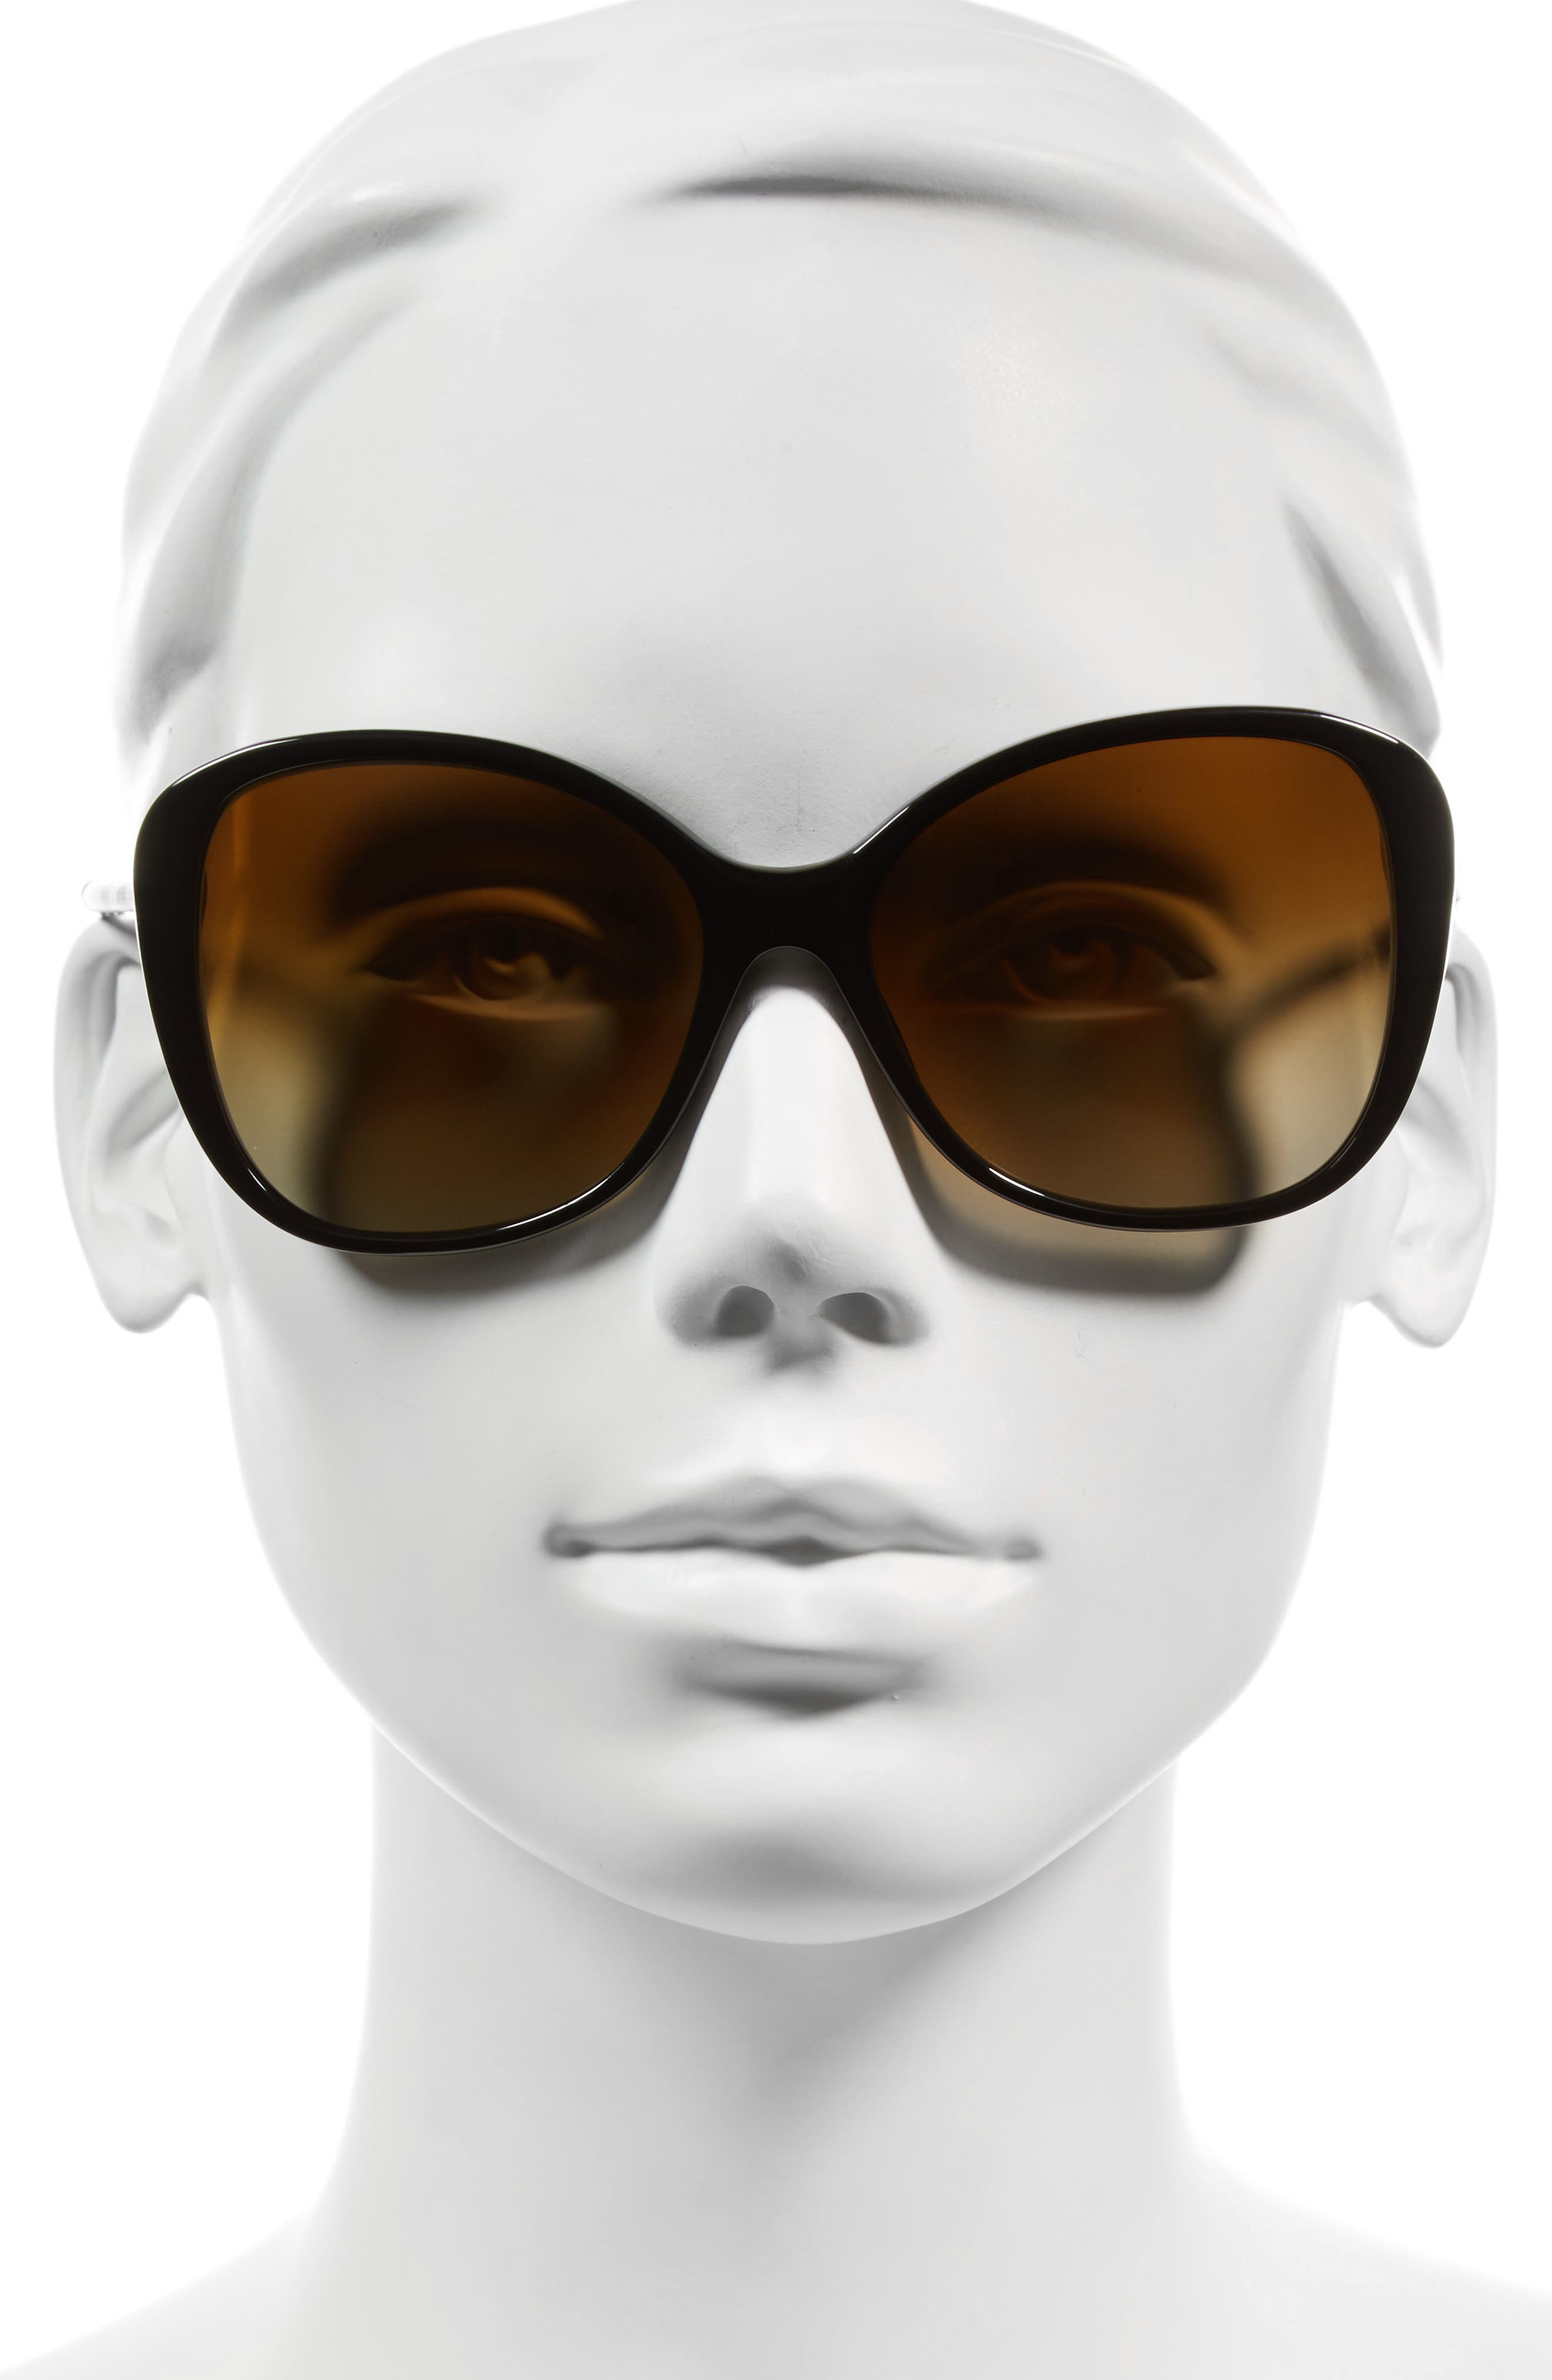 57mm Polarized Sunglasses,                             Alternate thumbnail 2, color,                             001